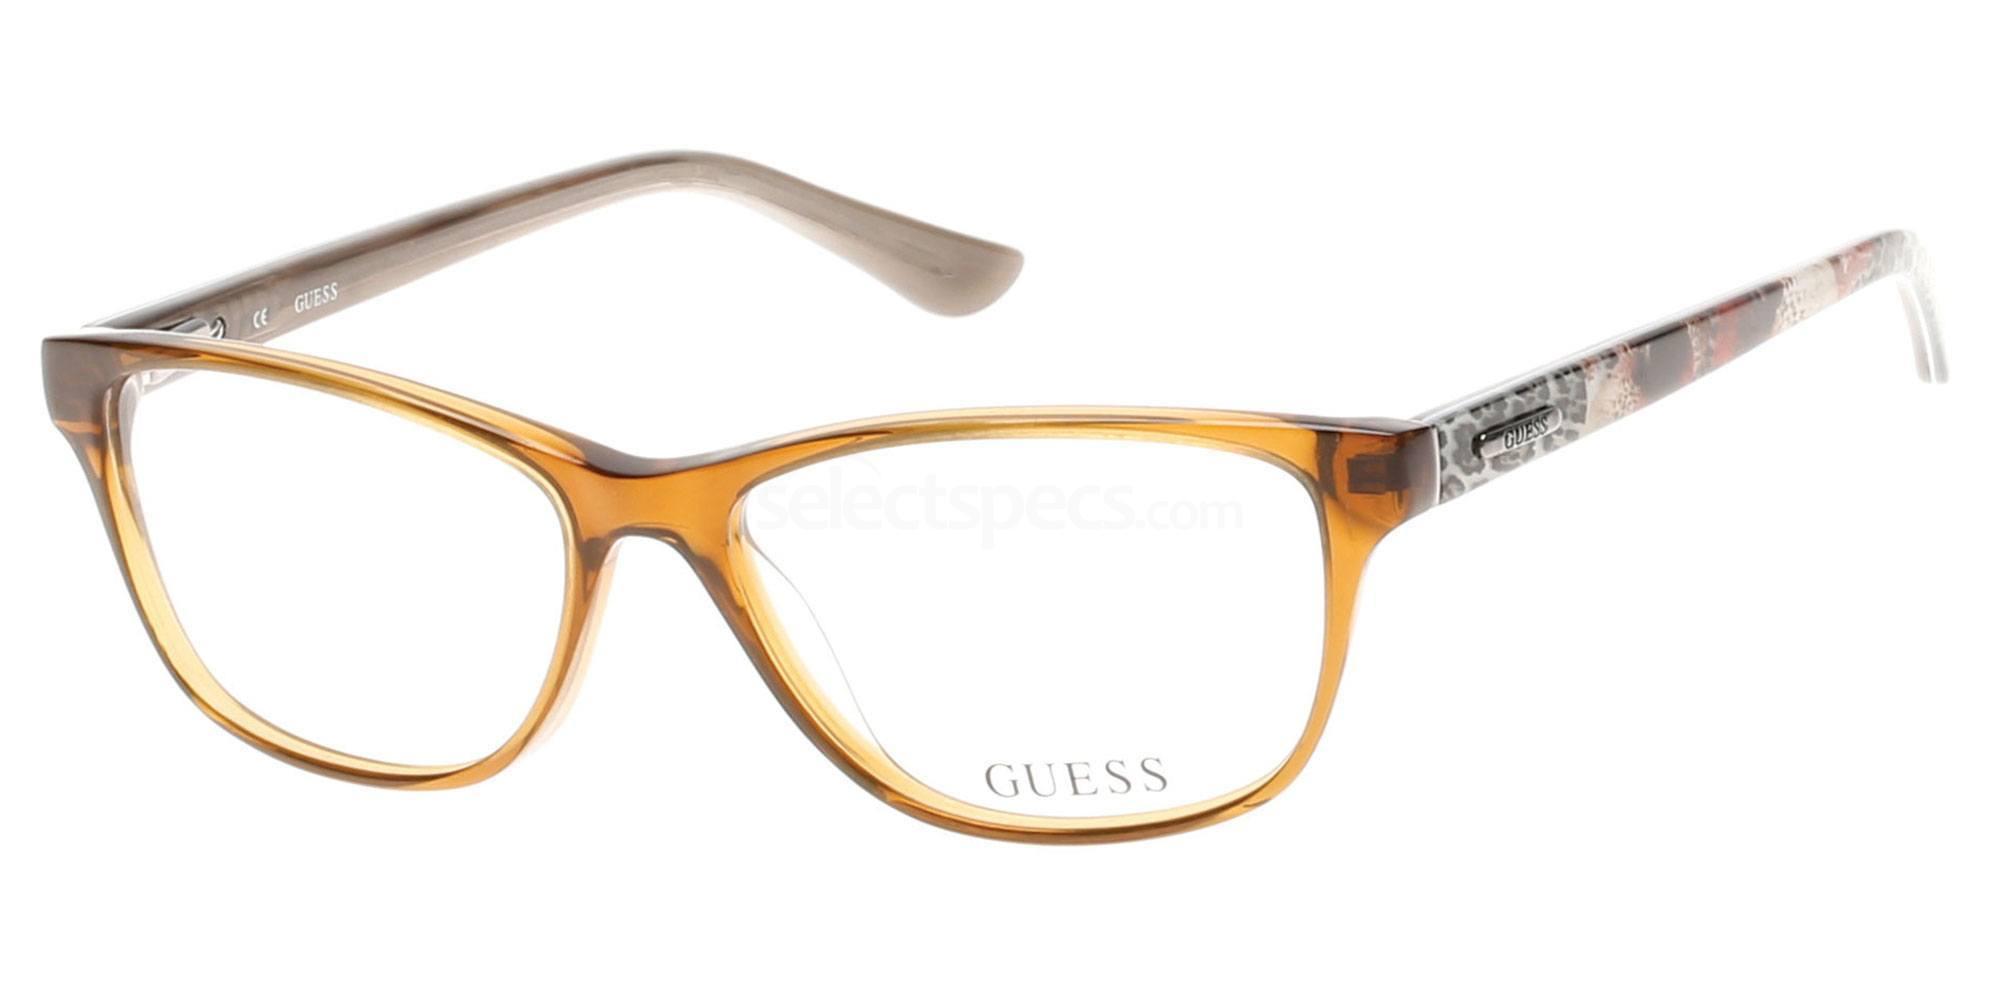 045 GU2513 Glasses, Guess